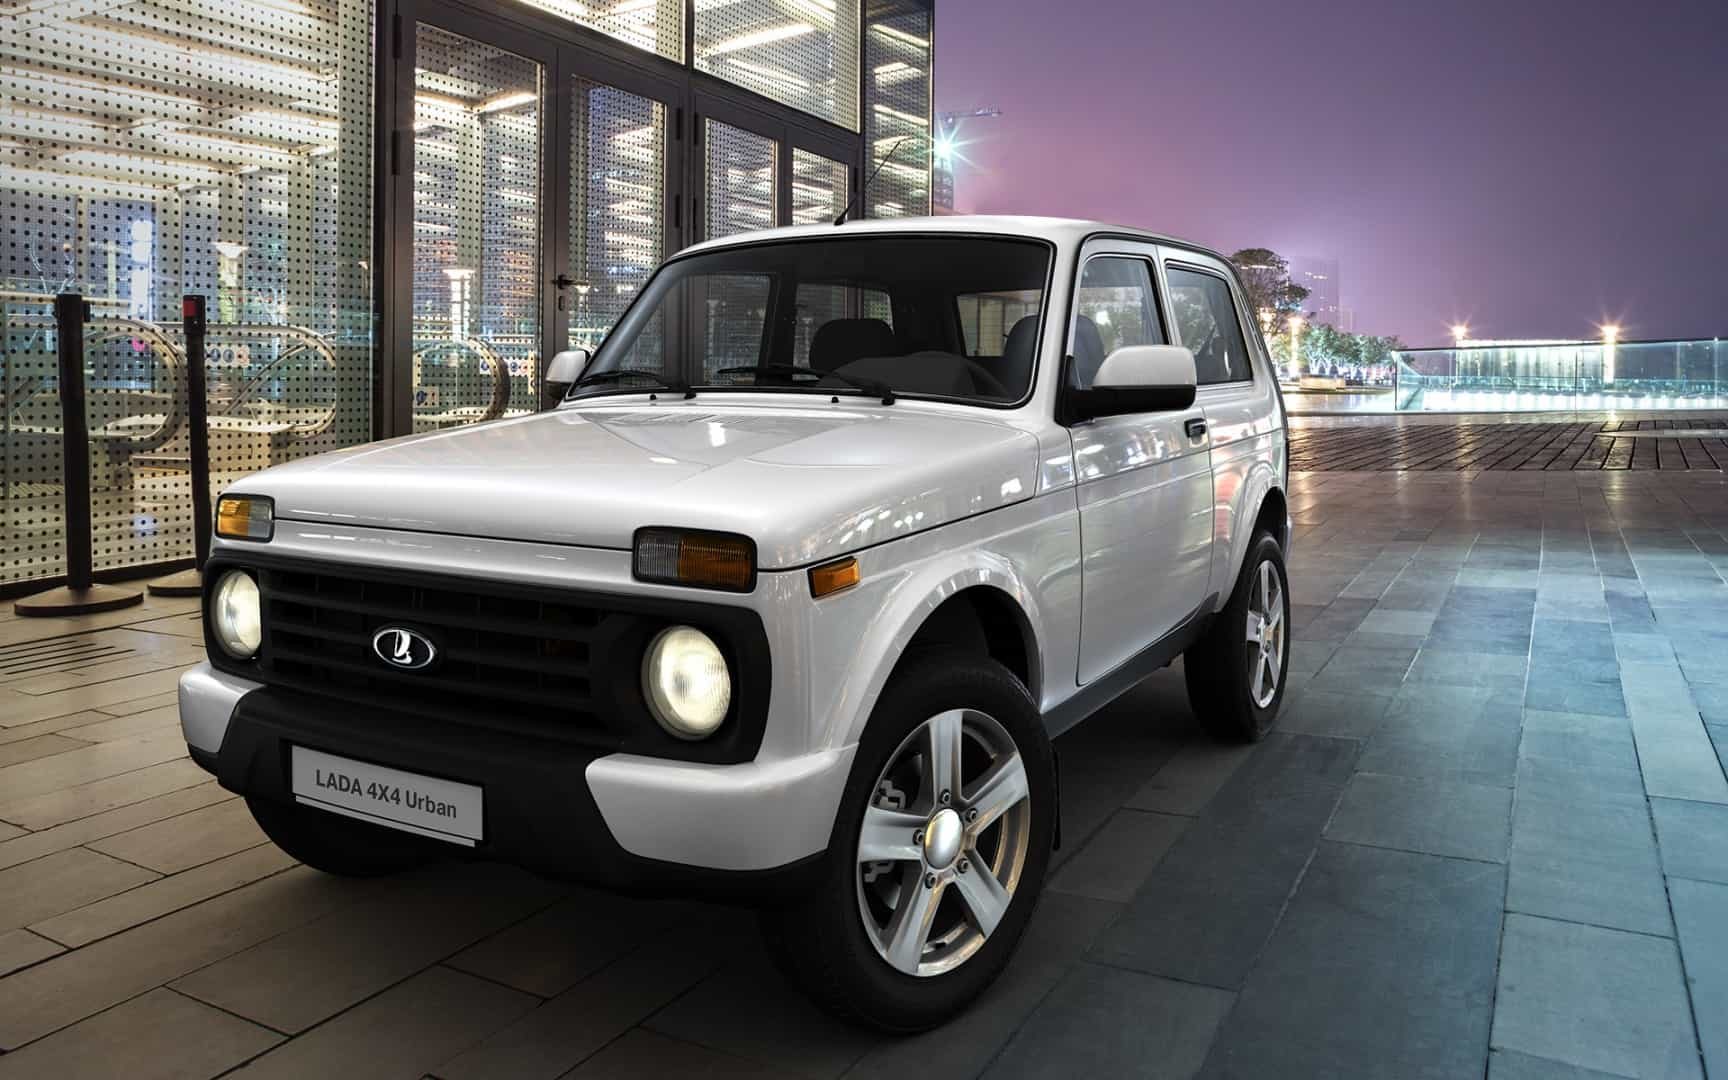 lada niva - Strongest Car Ever?